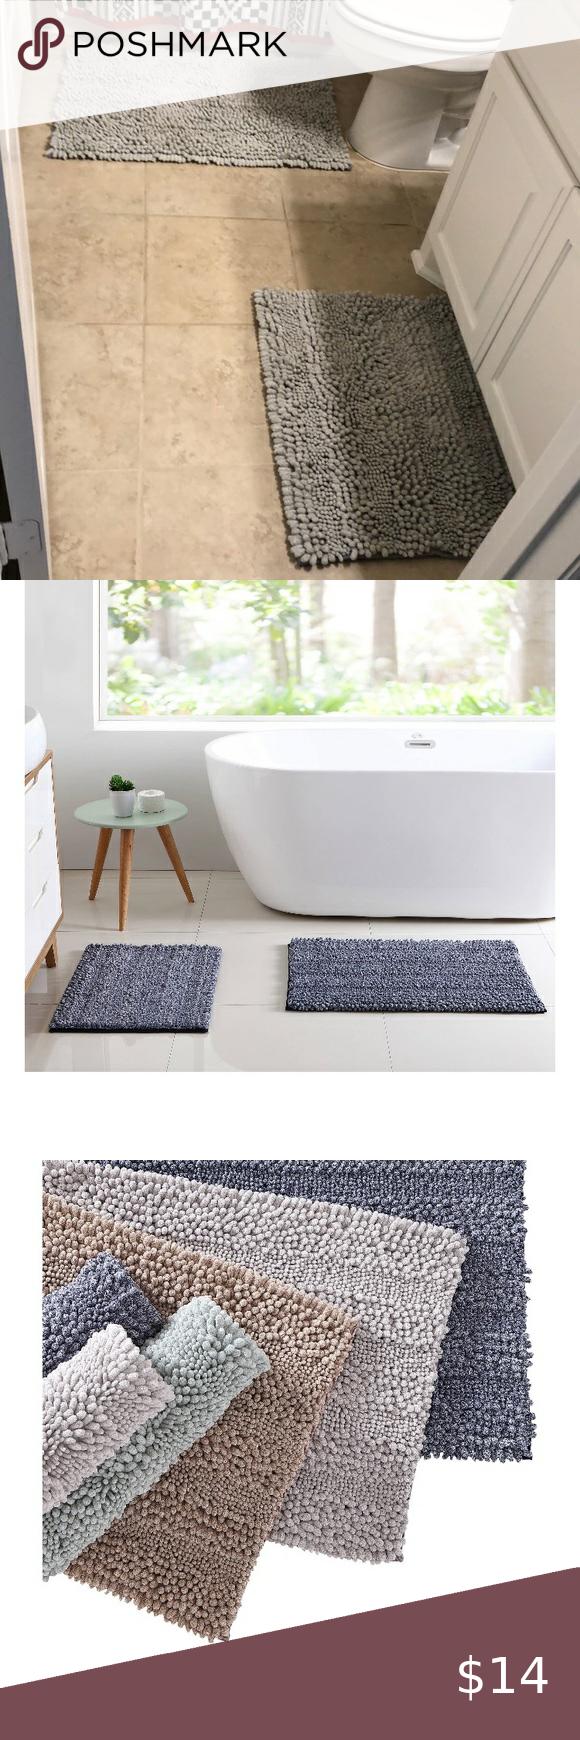 Better Homes And Garden 2 Pc Bath Rug Set Bath Rugs Sets Better Homes Rug Sets [ 1740 x 580 Pixel ]